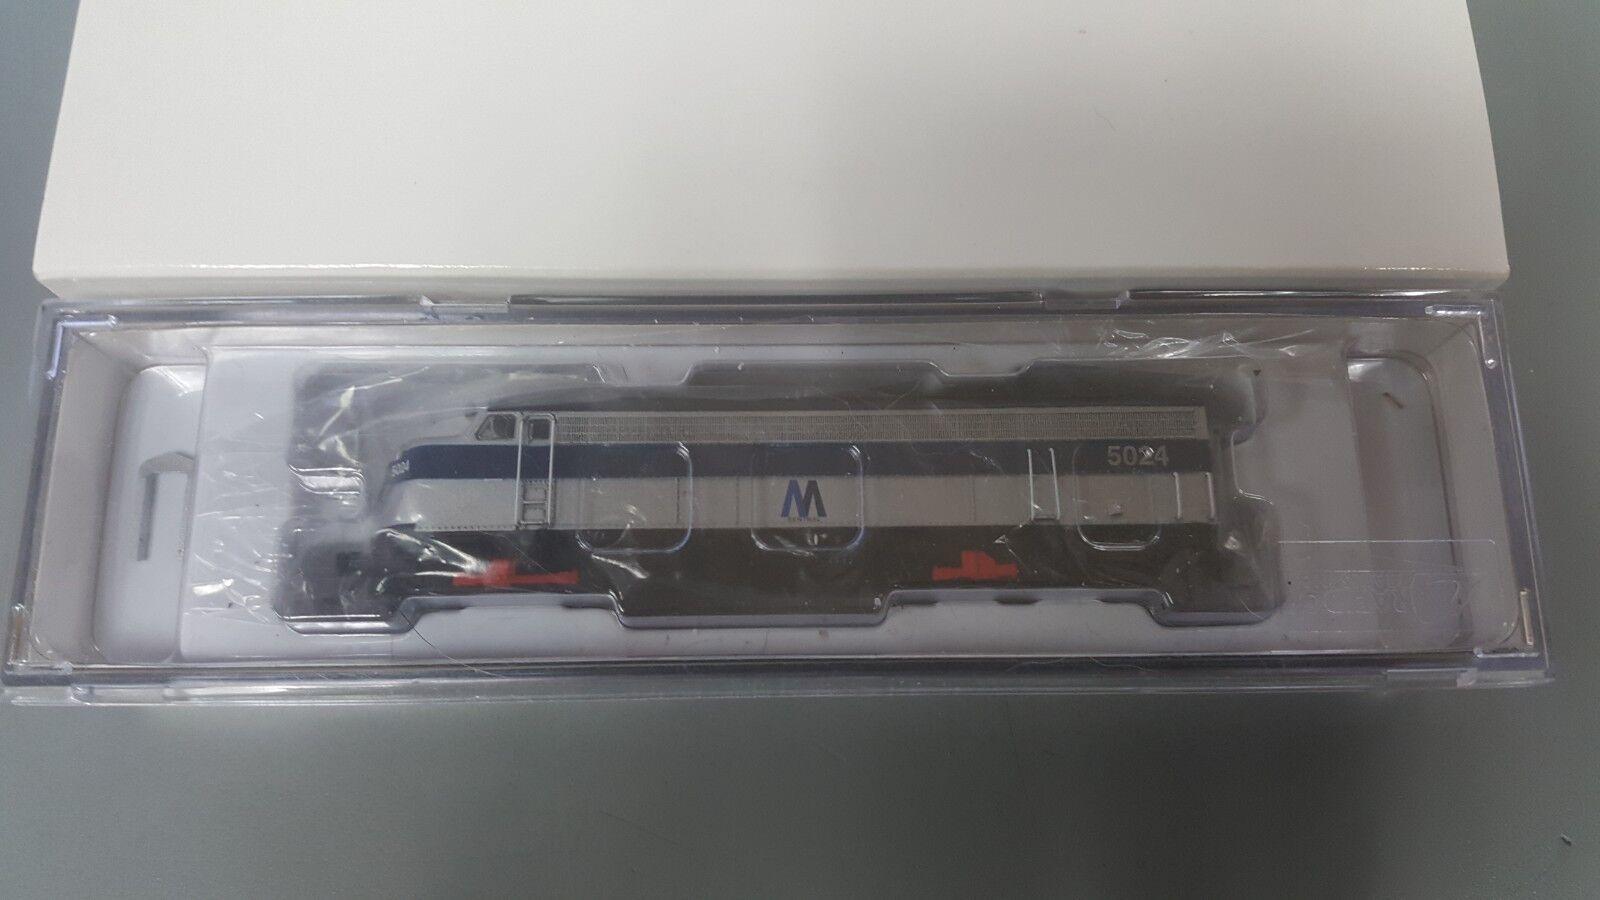 BRAND NEW N SCALE RAPIDO RAPIDO RAPIDO TRAINS 15046 EMD FL9 MTA DC DCC READY NEW 819ae7